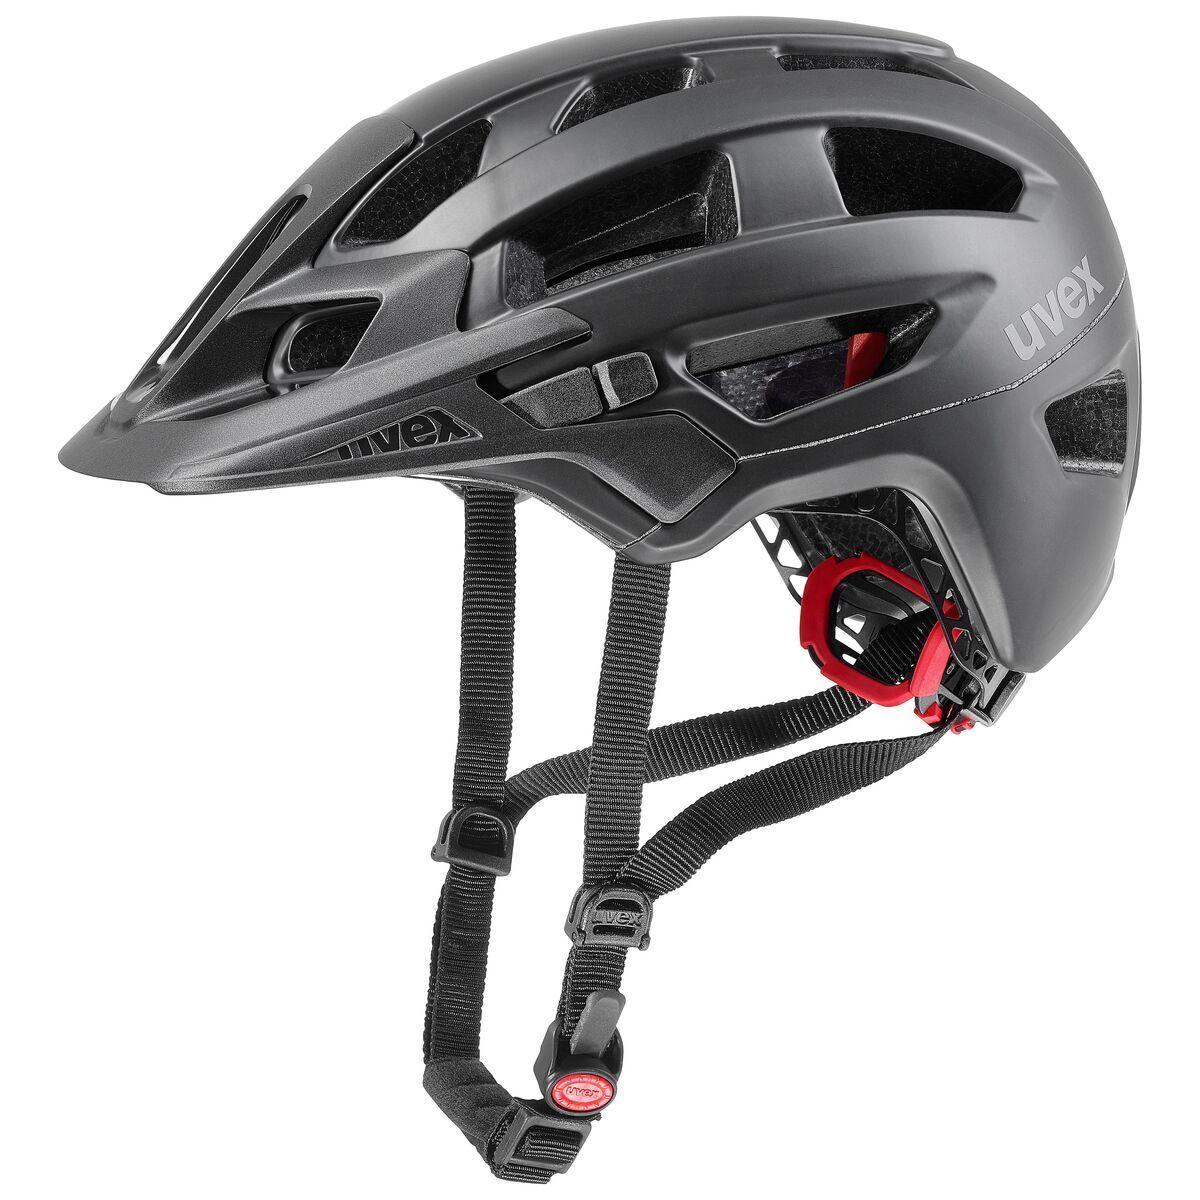 Uvex Finale Finale Finale 2.0 MTB Fahrrad Helm schwarz 2019 d41ffd